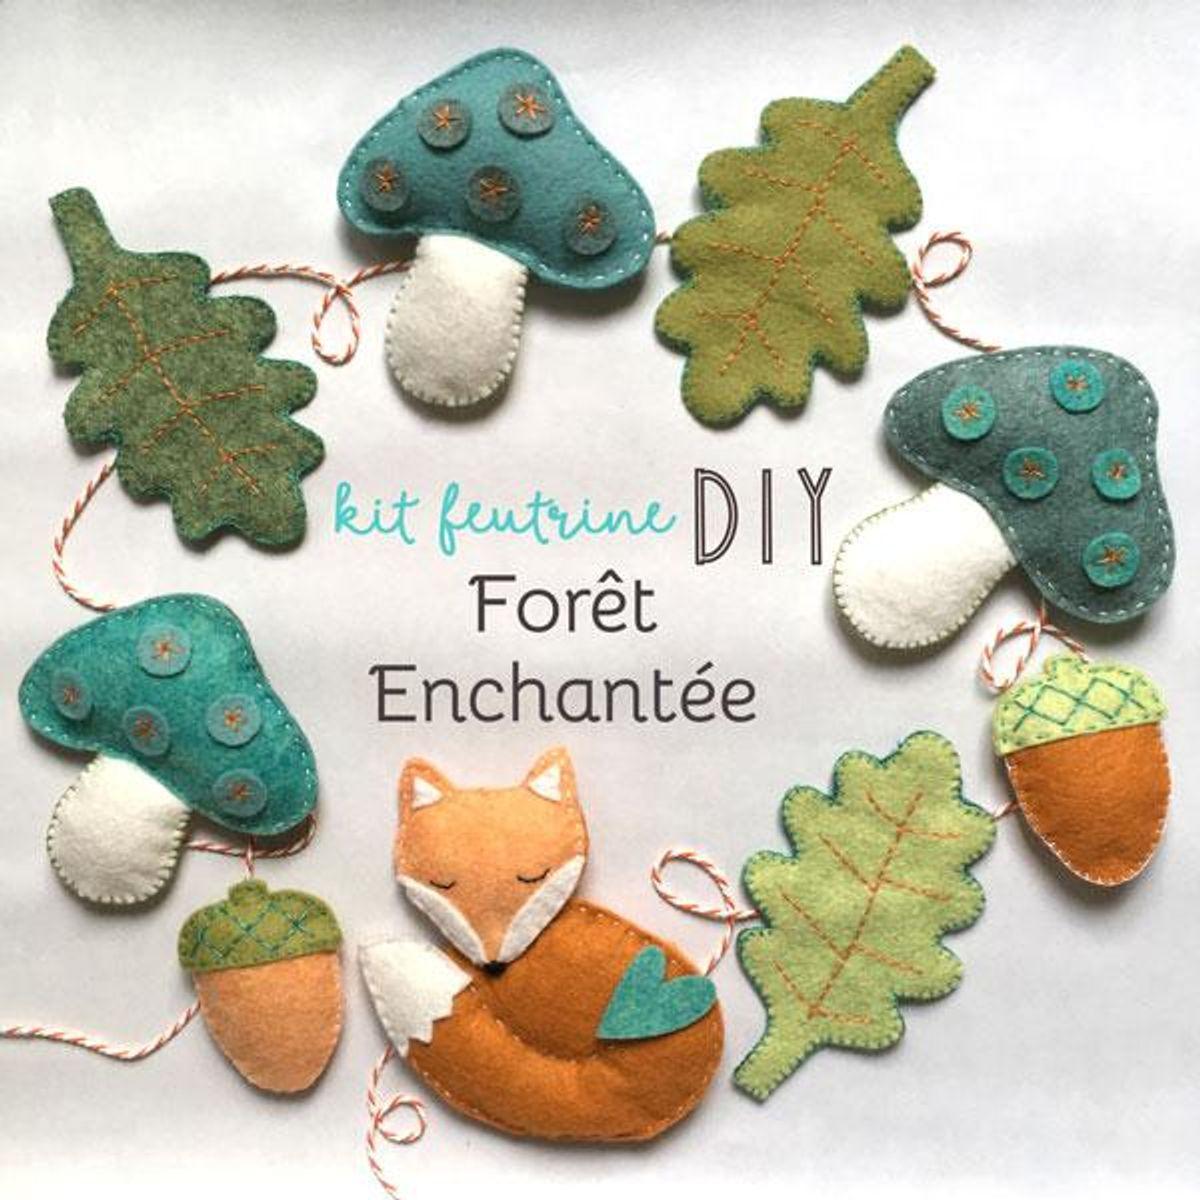 Kit feutrine DIY forêt enchantée